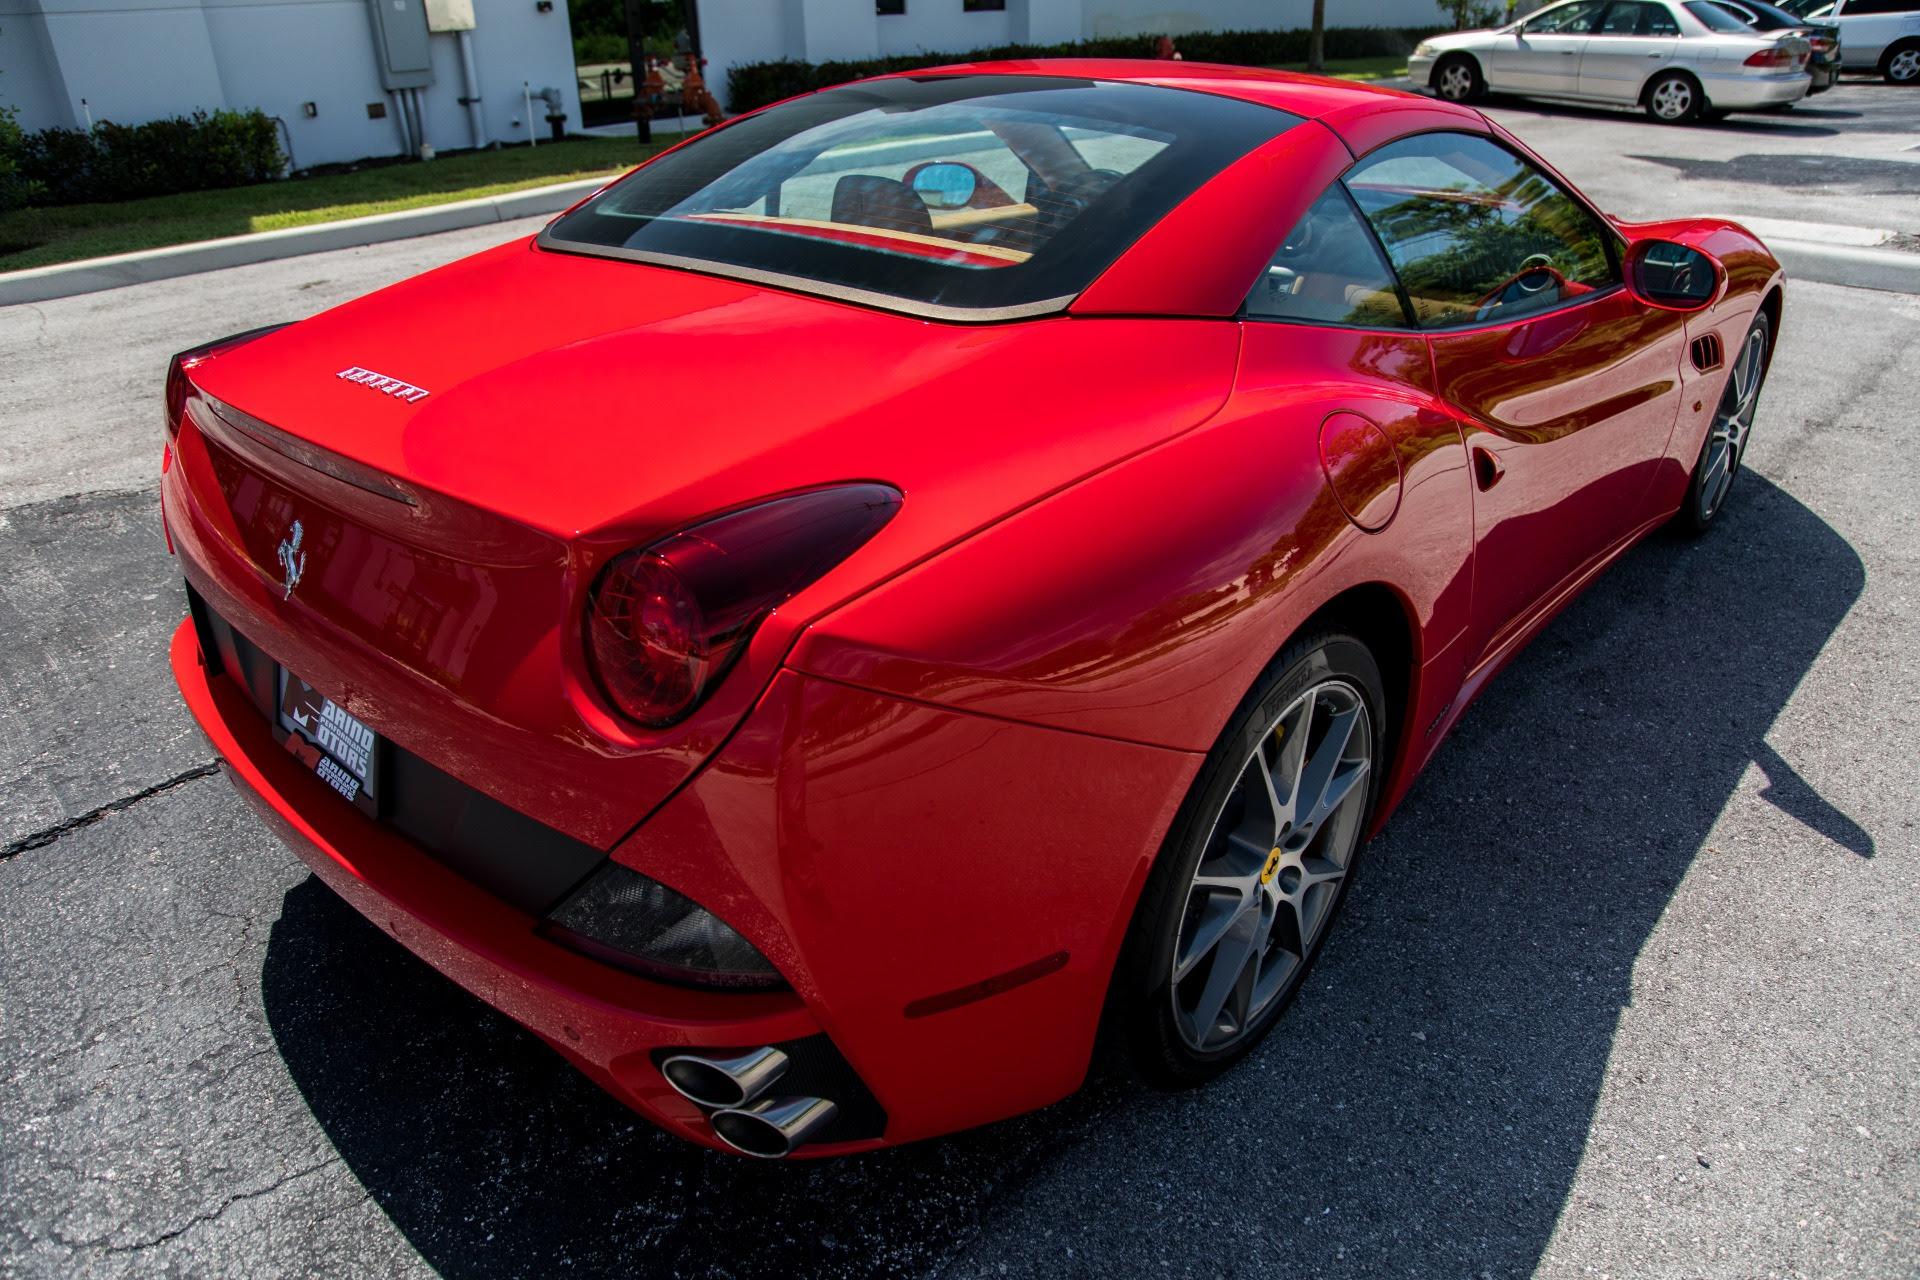 Used 2013 Ferrari California For Sale ($114,900) | Marino ...